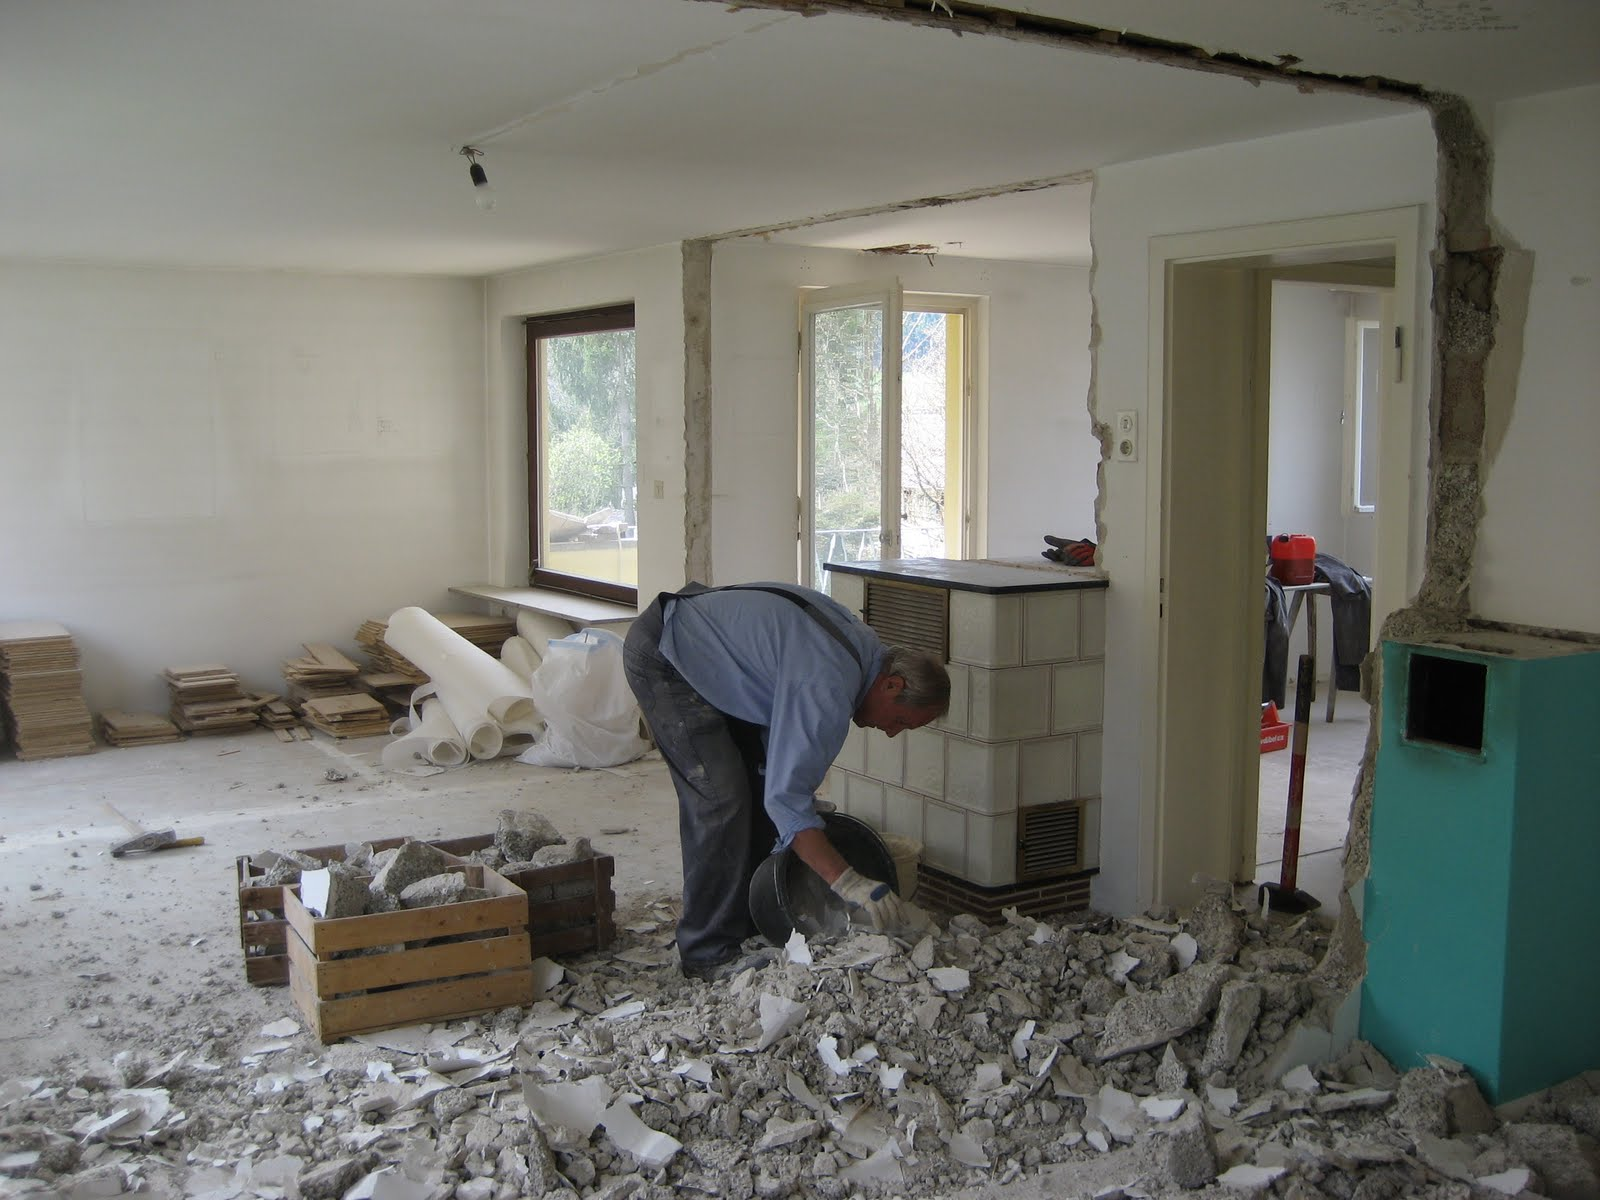 Durchbruch tragende wand 9138 made house decor - Durchbruch tragende wand anleitung ...